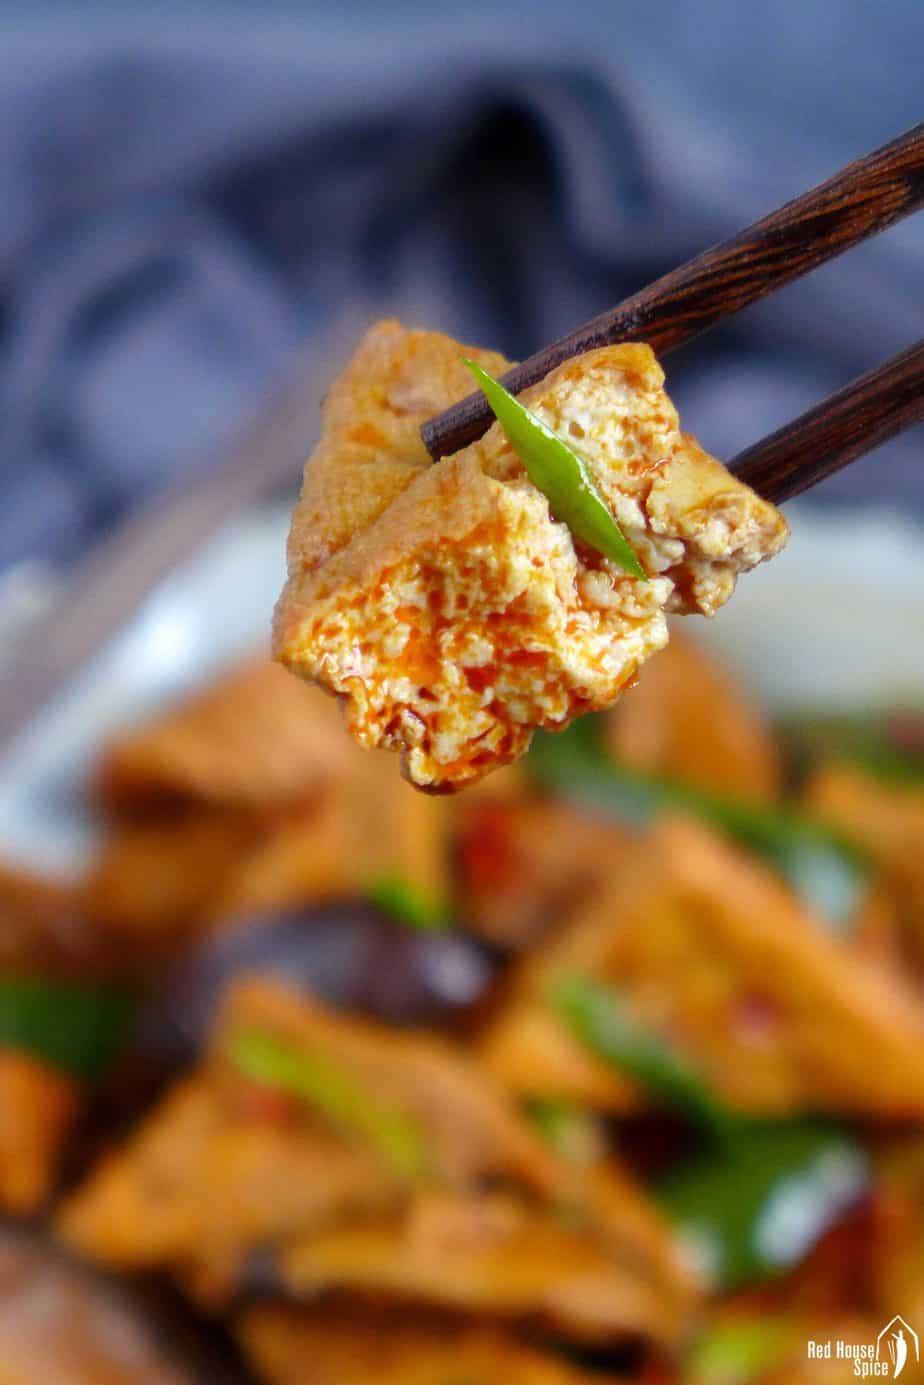 chopsticks picking up a piece of fried tofu